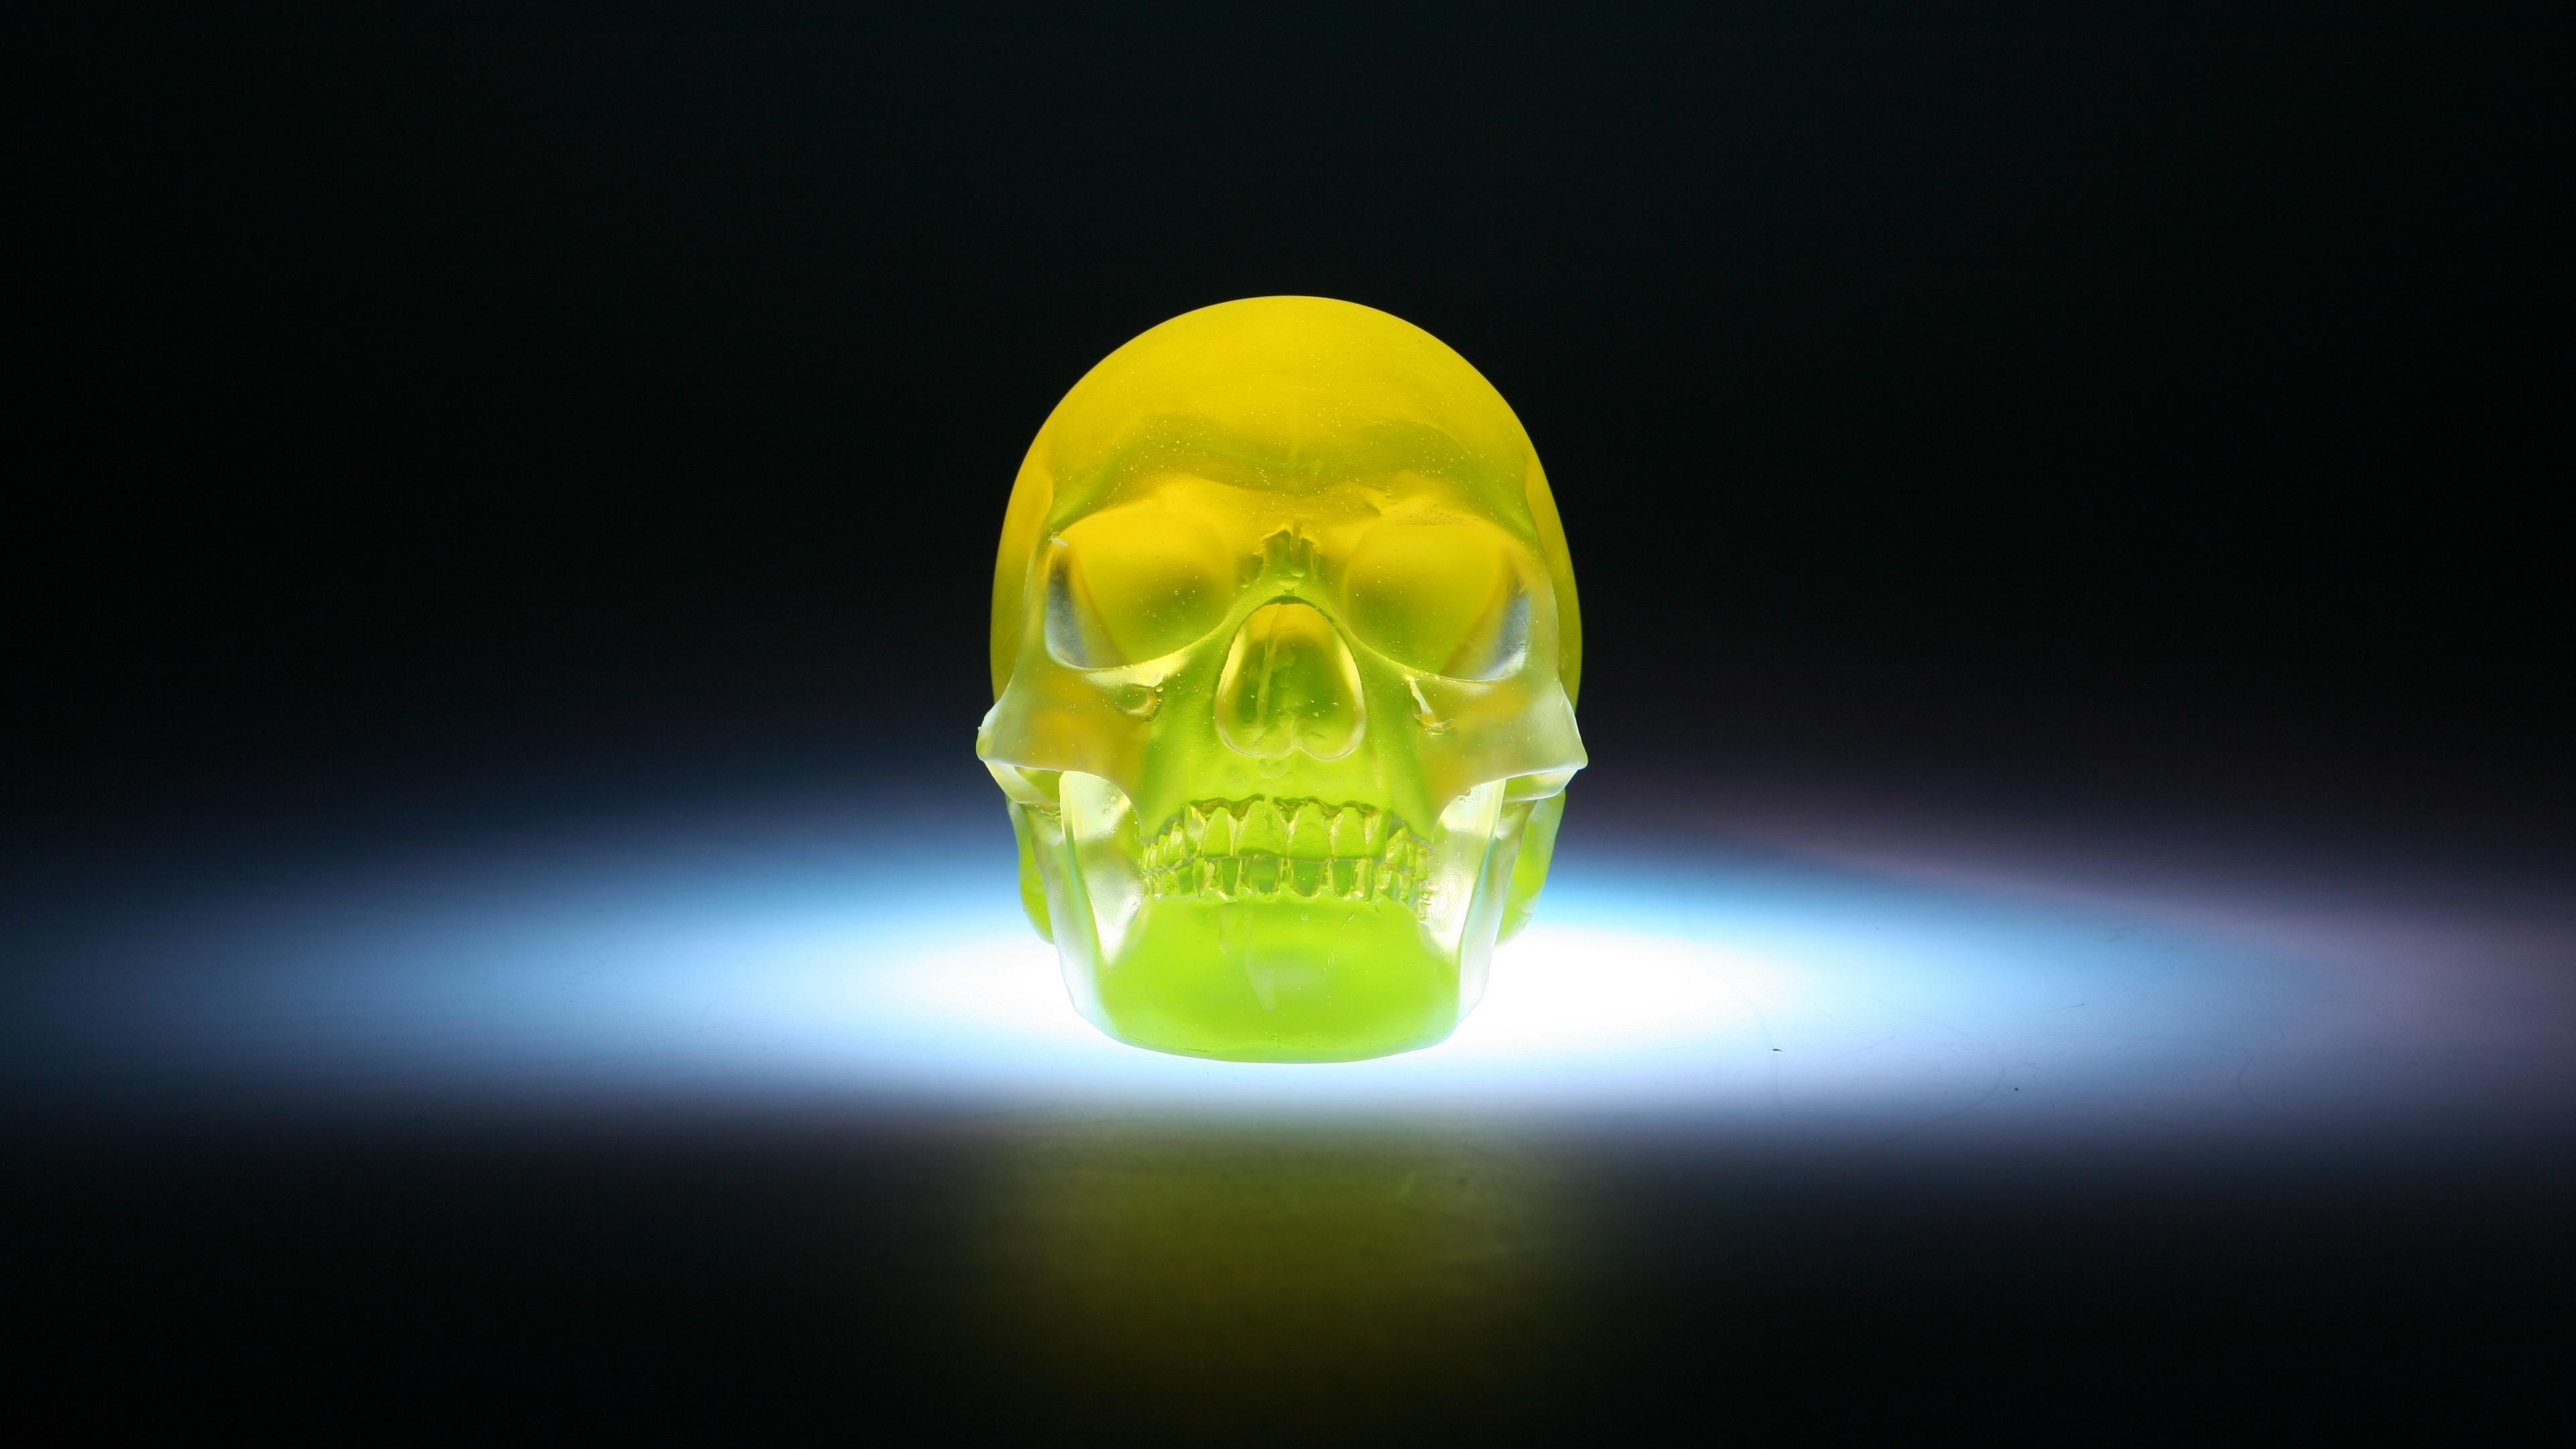 Neon Skull Wallpaper - Green Glow In The Dark Skull - HD Wallpaper